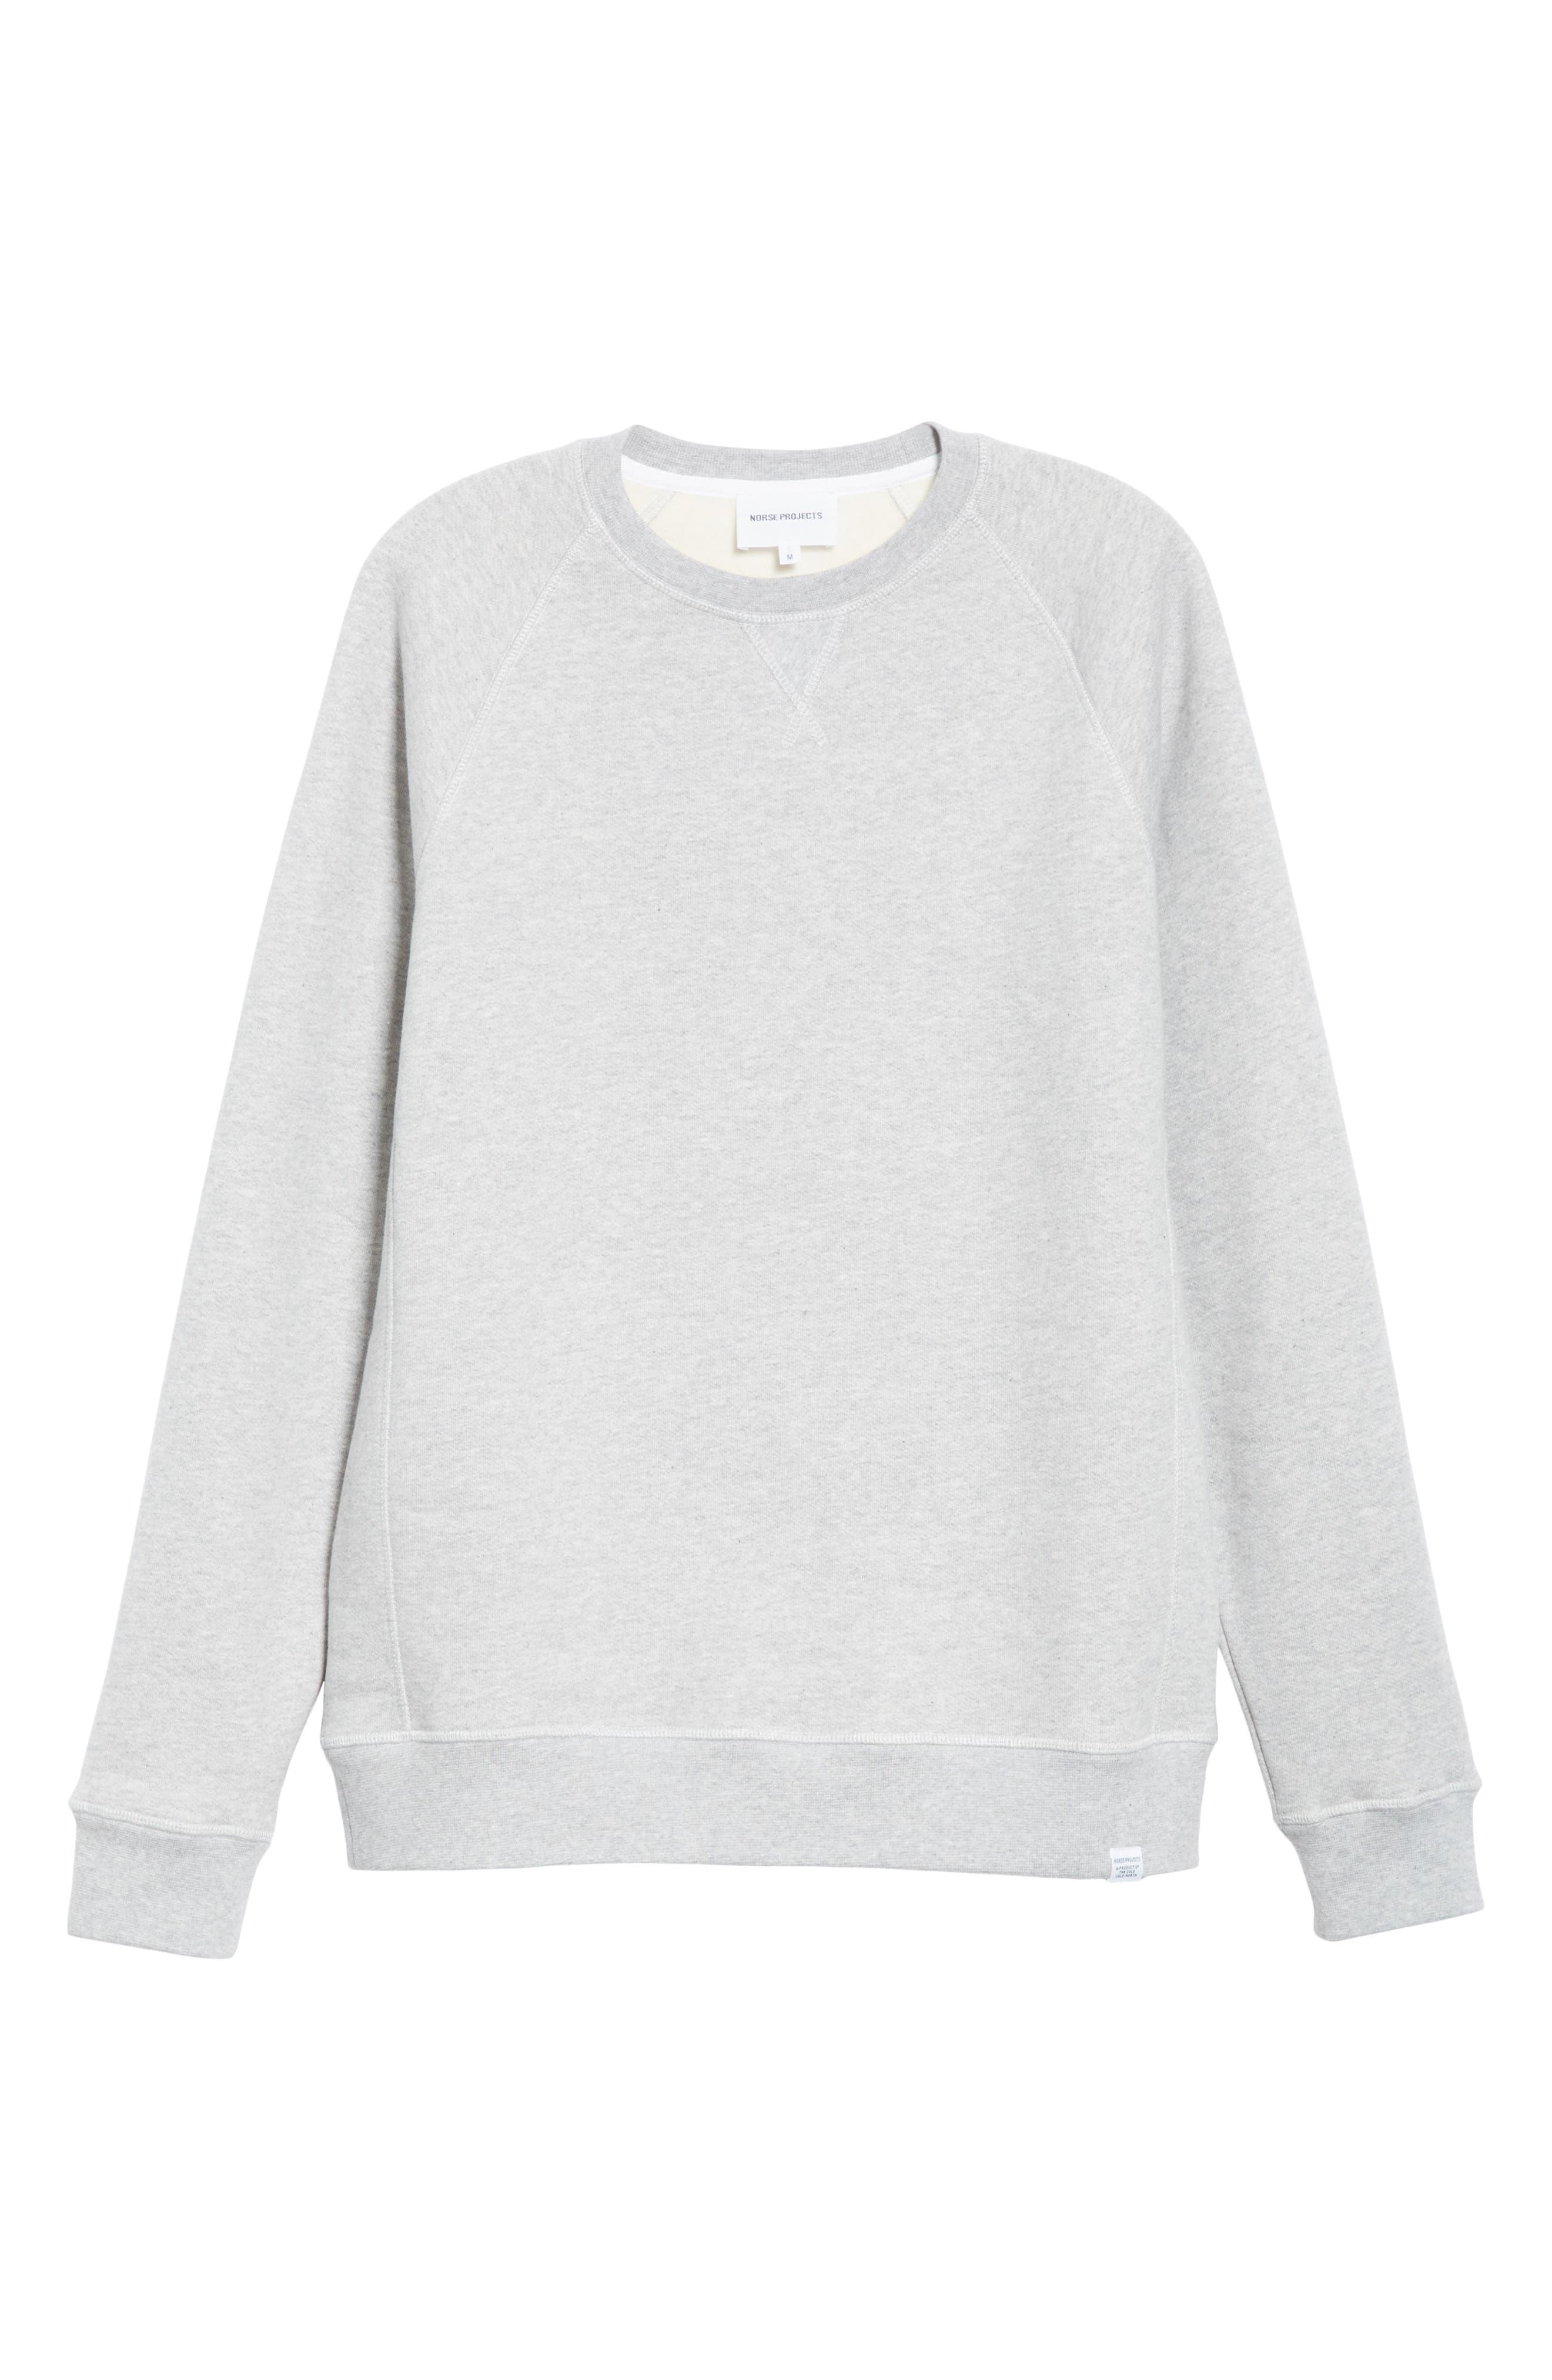 NORSE PROJECTS, Ketel Raglan Sweatshirt, Alternate thumbnail 6, color, LIGHT GREY MELANGE